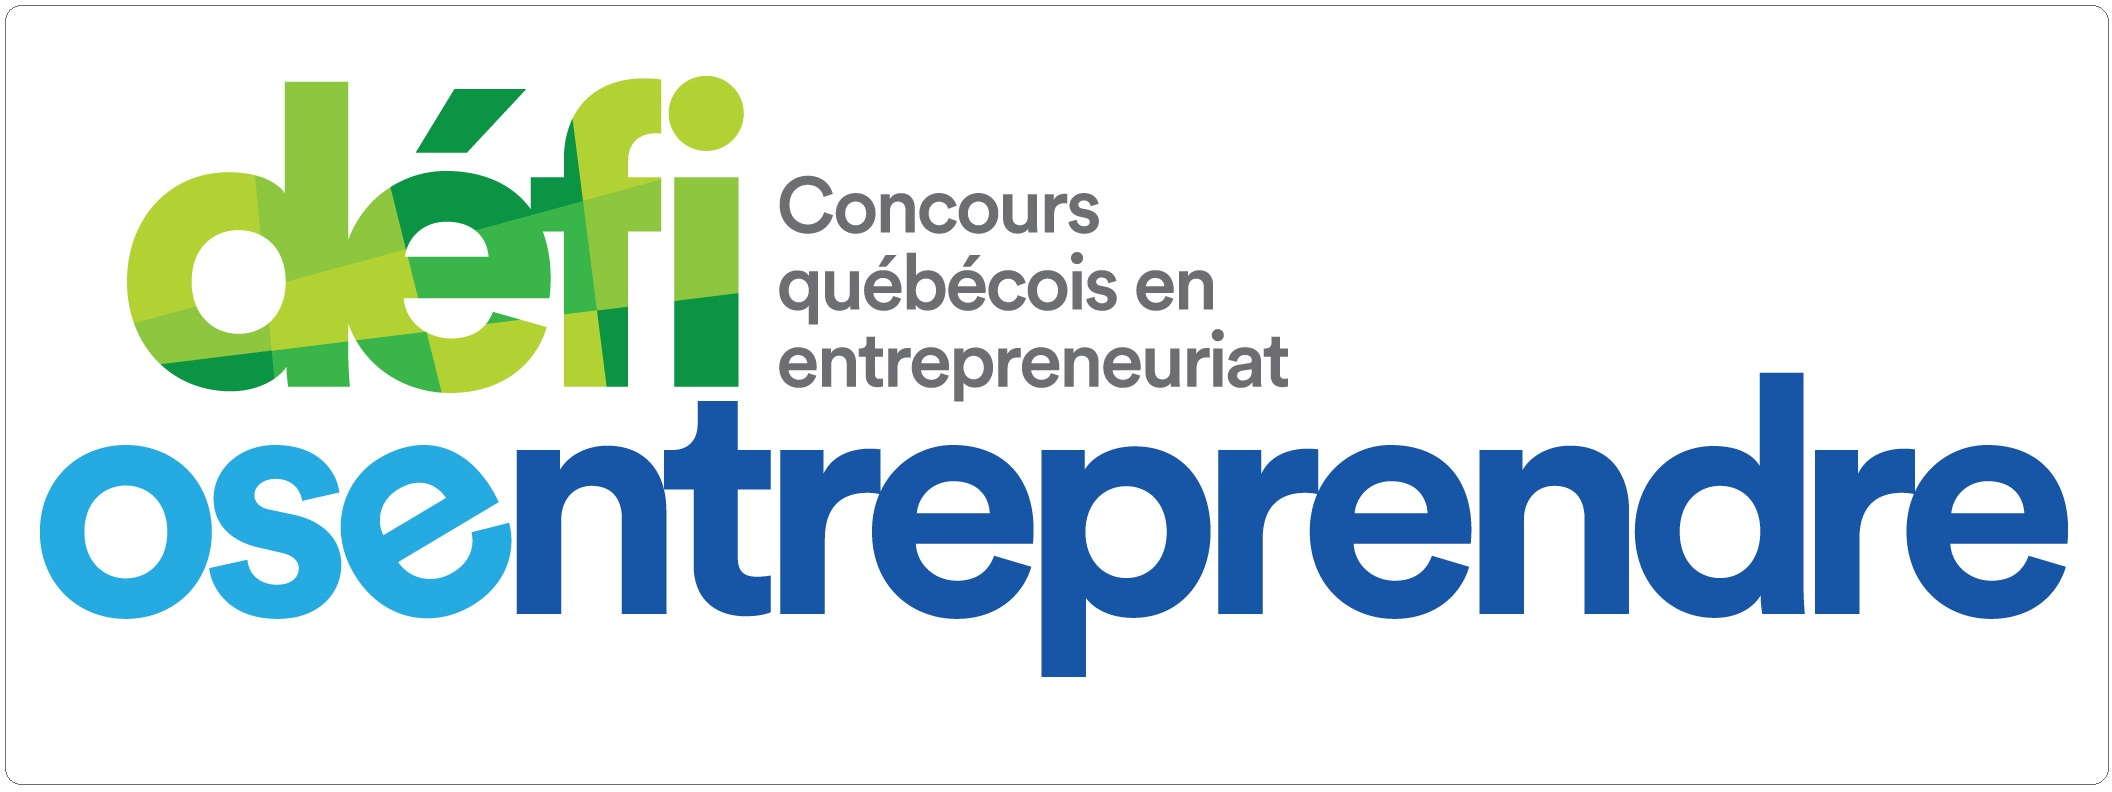 Logo-defi-osentreprendre-photo-courtoisie-publiee-par-INFOSuroit_com.jpg